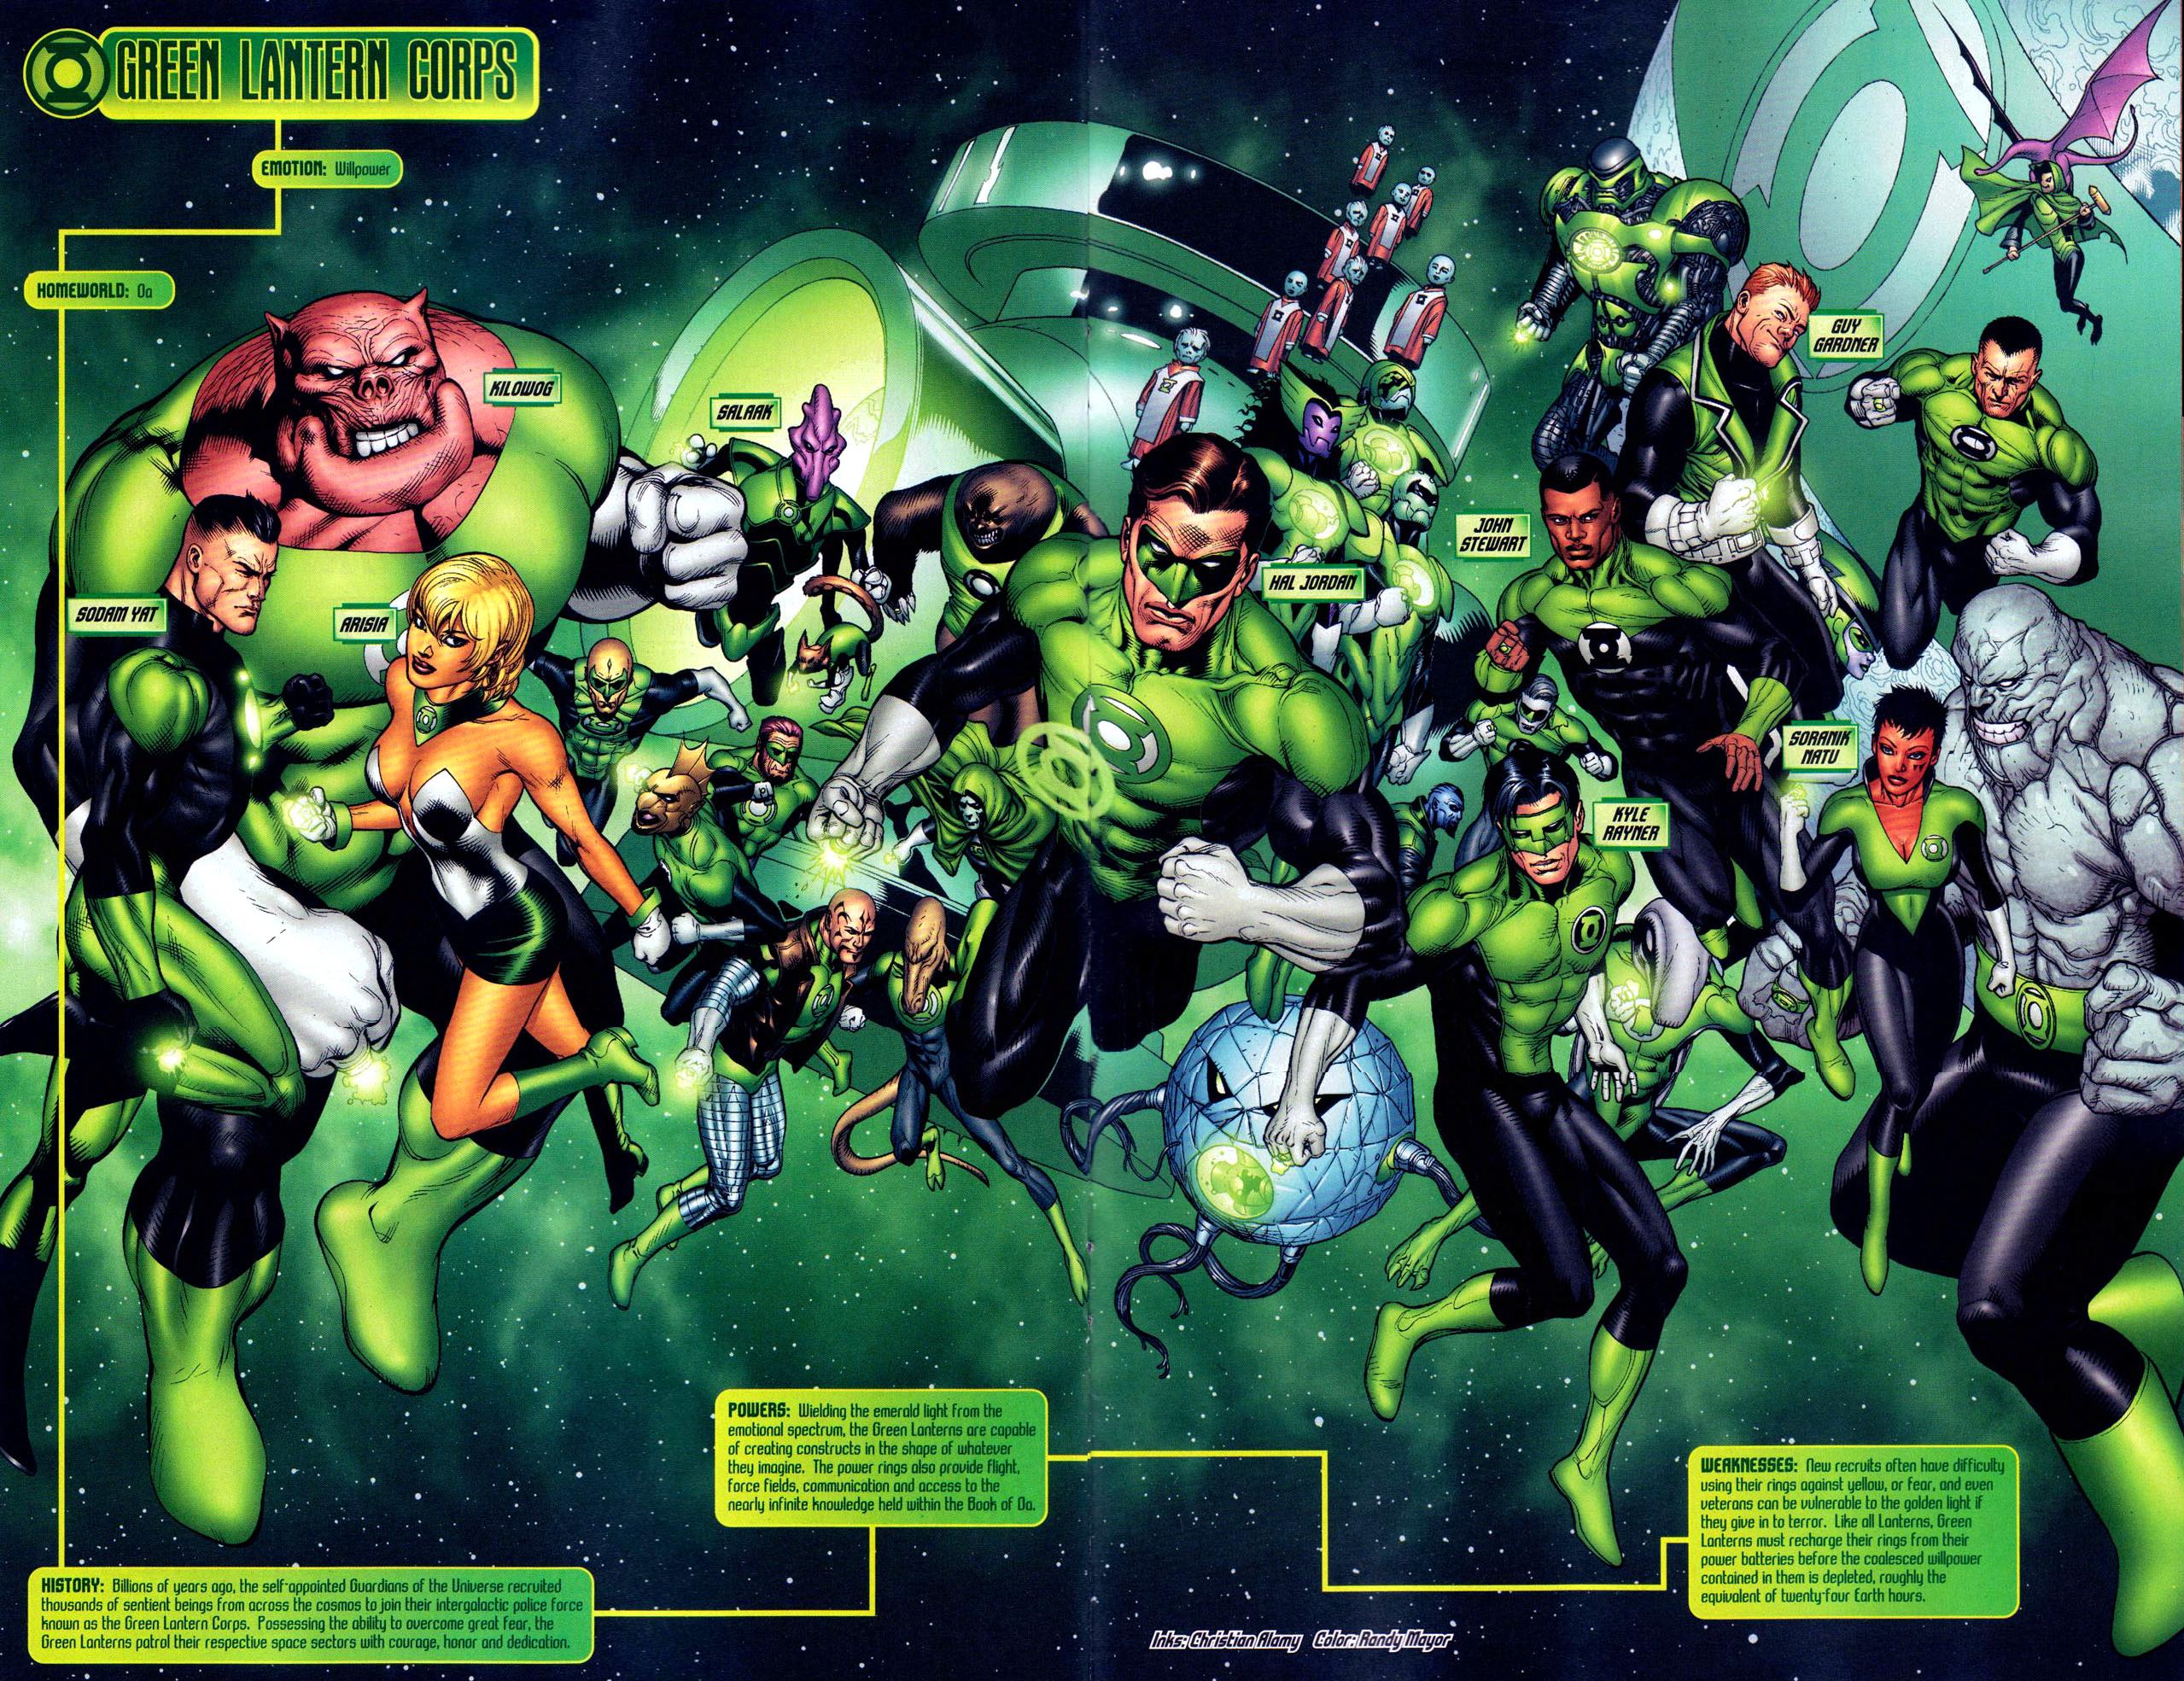 green lantern corps (blackest night)